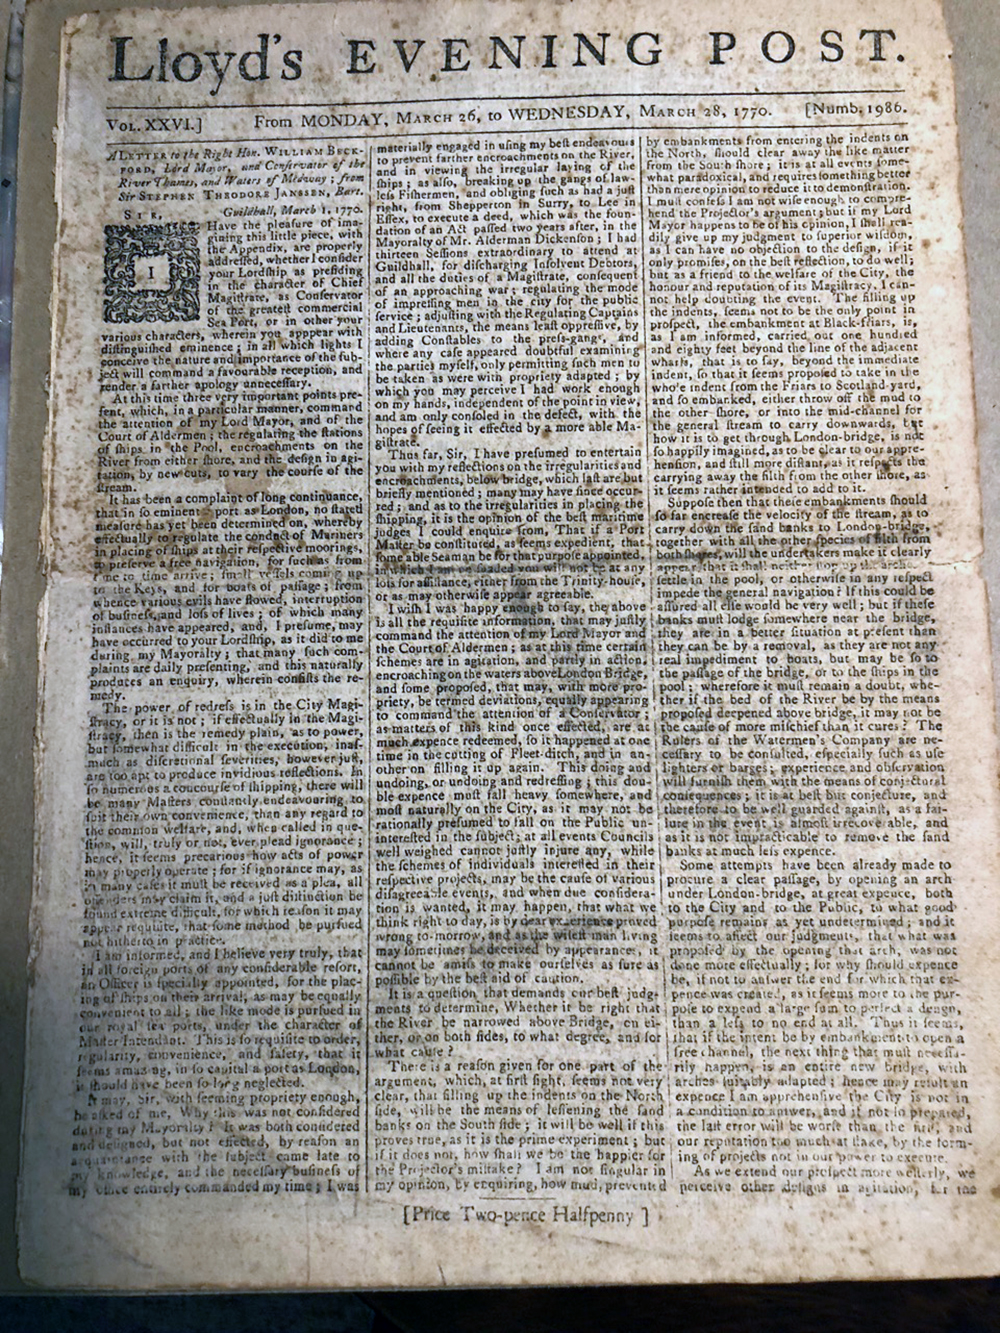 Lloyd's Evening Post, 1770